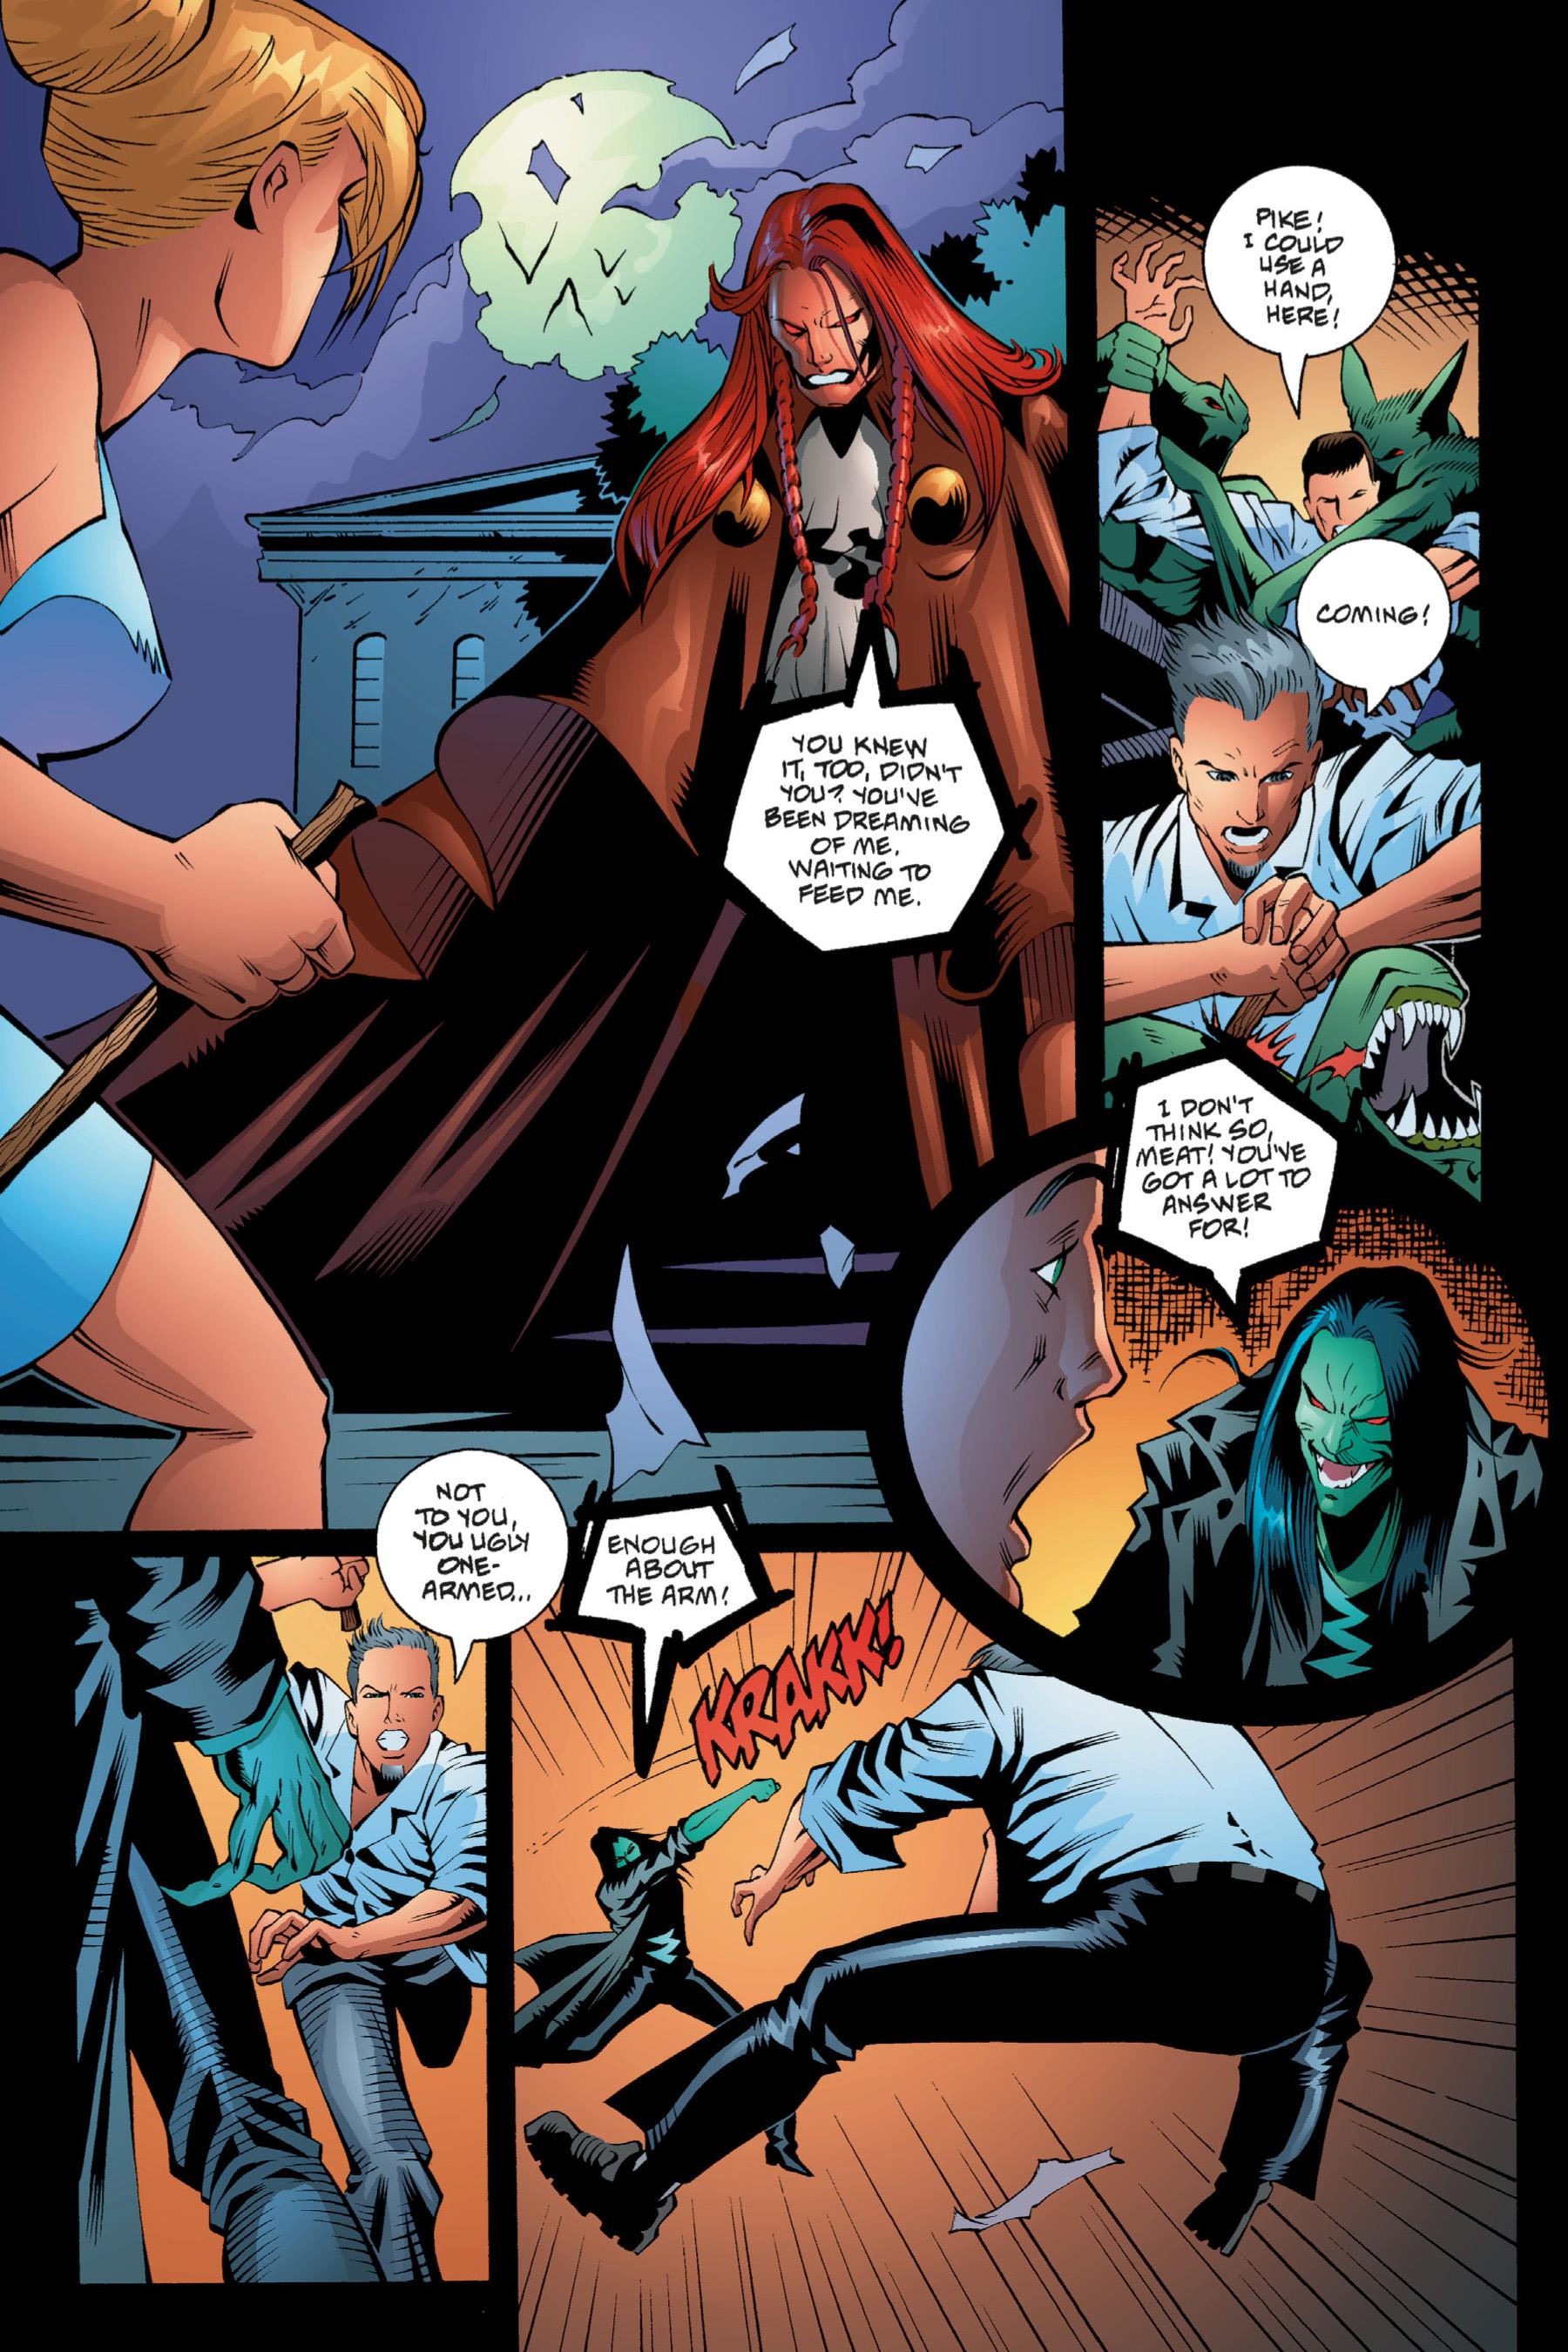 Read online Buffy the Vampire Slayer: Omnibus comic -  Issue # TPB 1 - 96